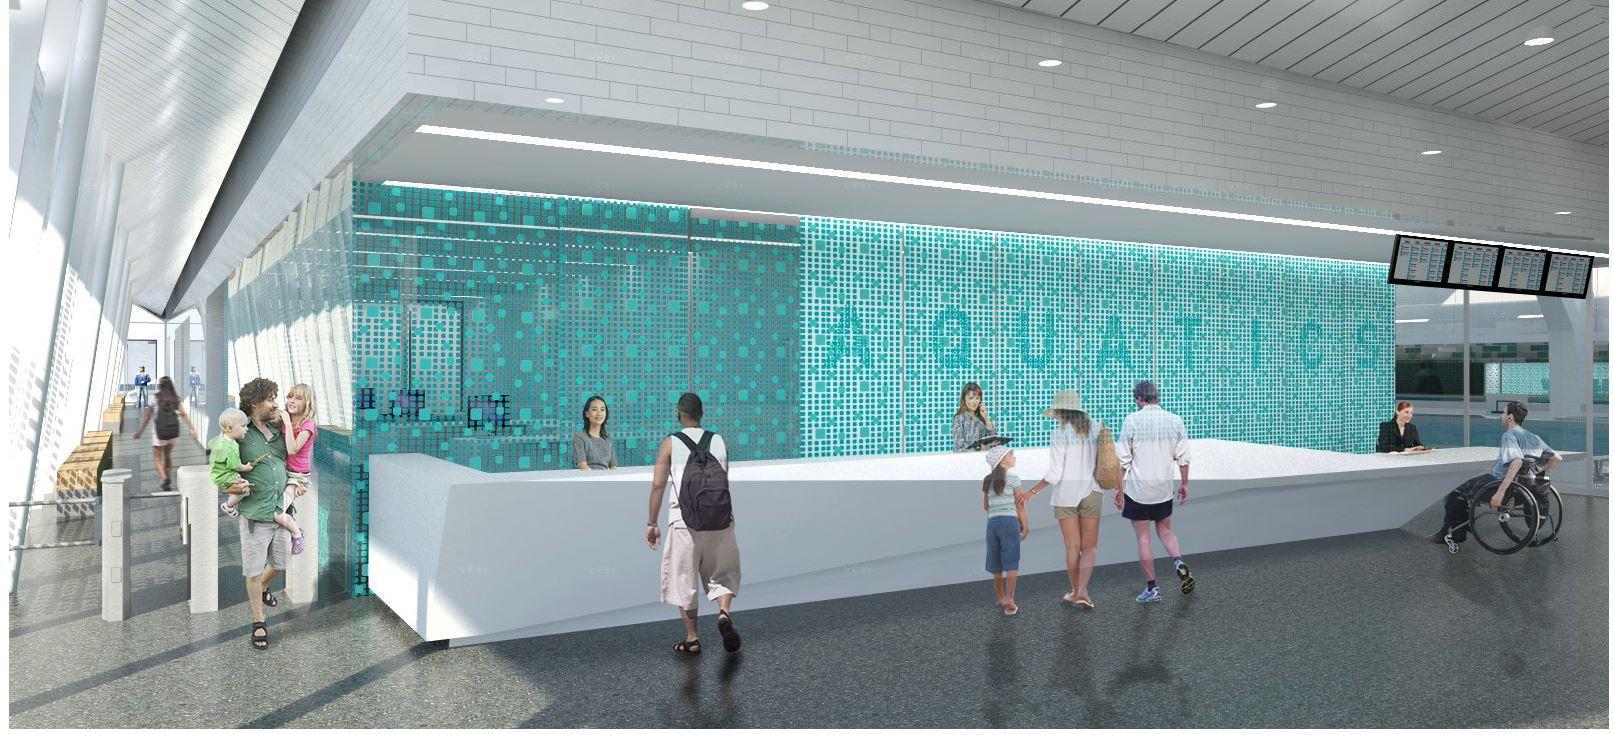 New ubc aquatic centre construction updates ubc recreation for Pool design vancouver